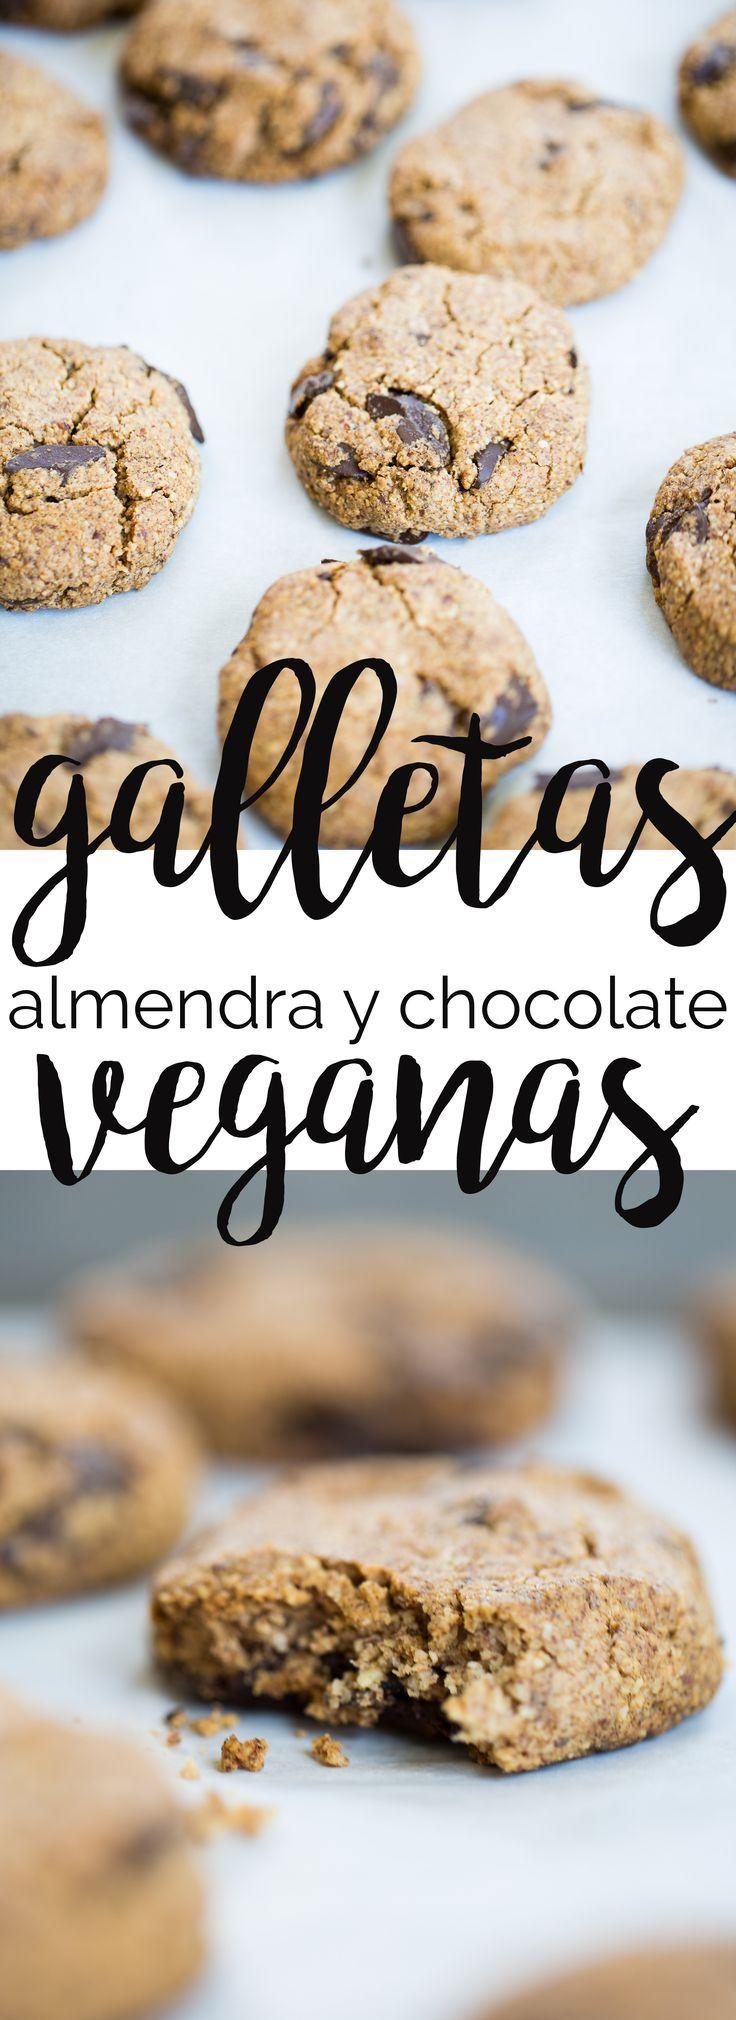 Recipe gluten free vegan New Ideas Cookies Gluten Free, Vegan Gluten Free Desserts, Vegan Dessert Recipes, Healthy Cookies, Vegan Sweets, Healthy Desserts, Easy Desserts, Cookie Recipes, Delicious Desserts